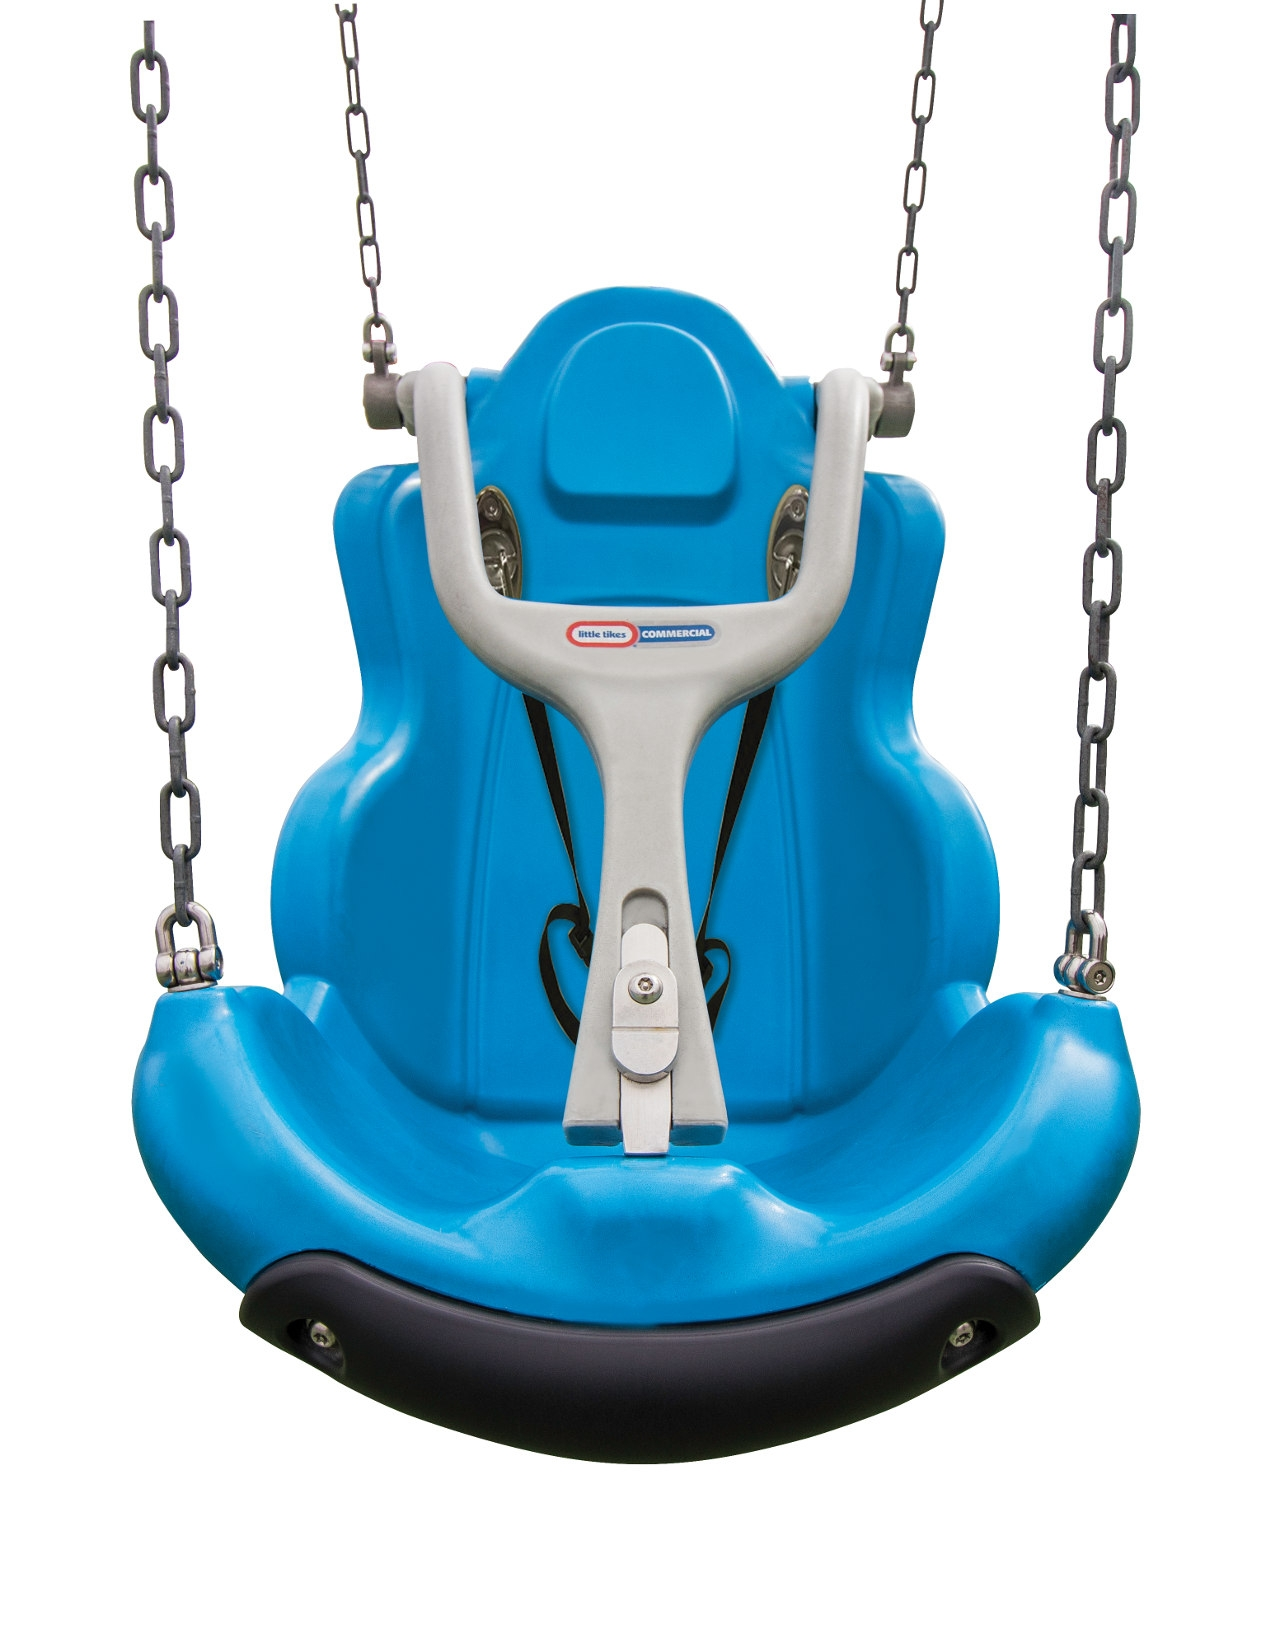 Little Tikes Inclusive Swing Seat